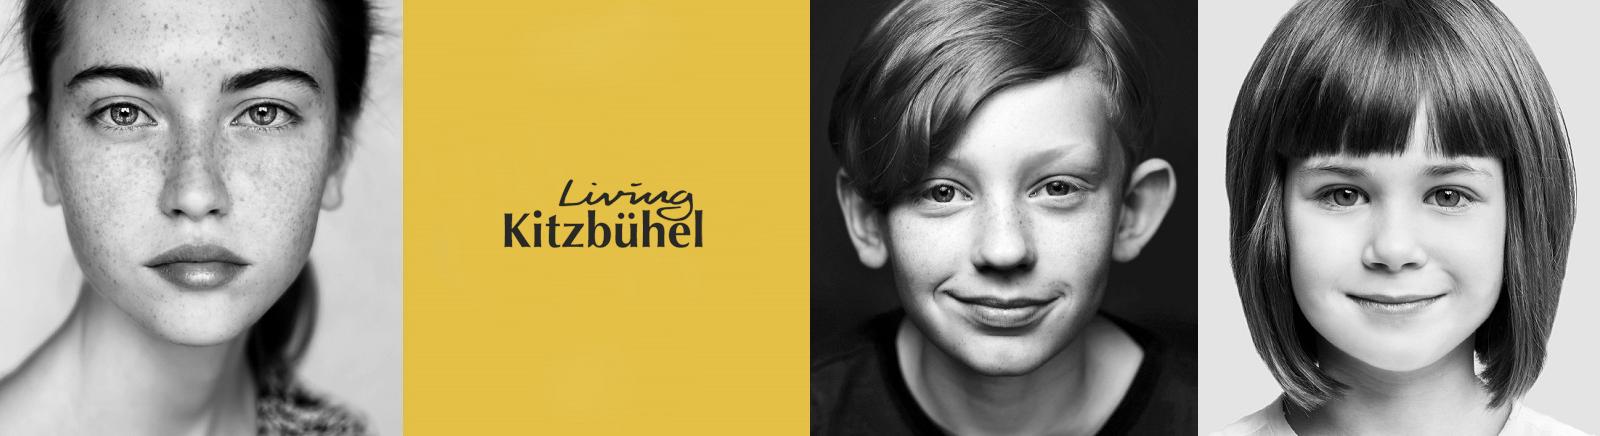 Juppen: Living Kitzbühel Bequeme Hausschuhe für Herren online shoppen